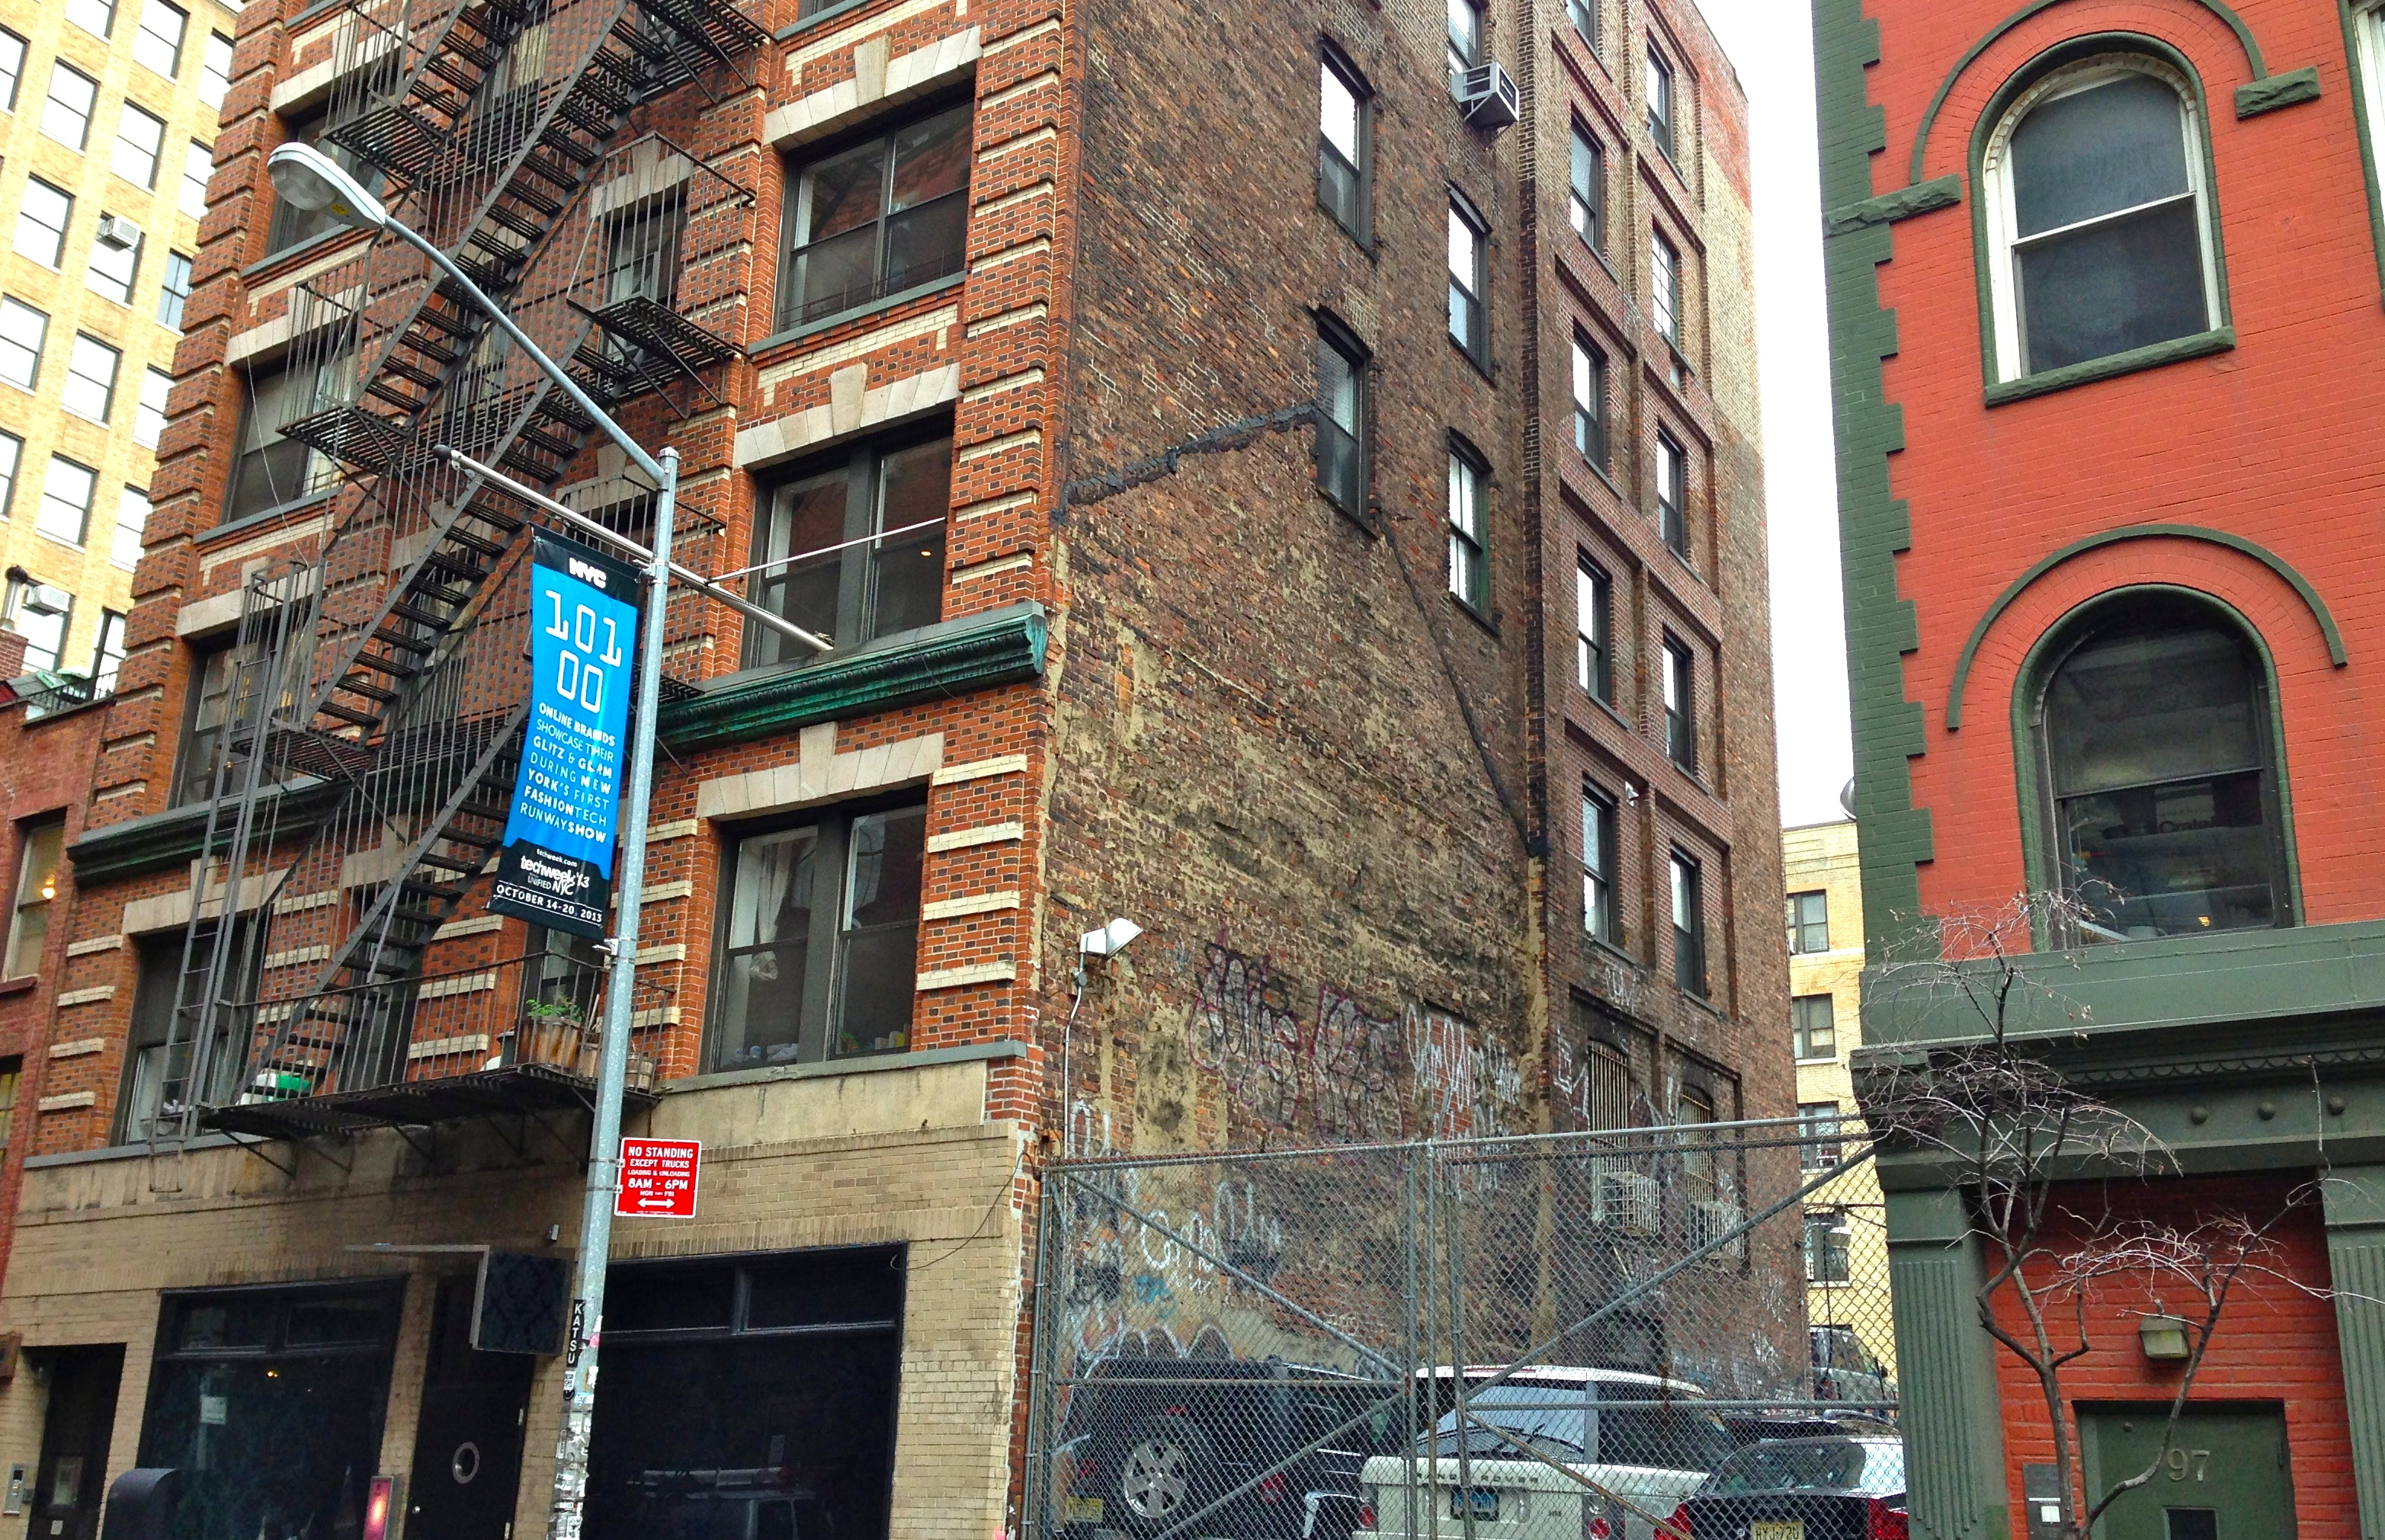 Old building outlines new york ephemeral new york